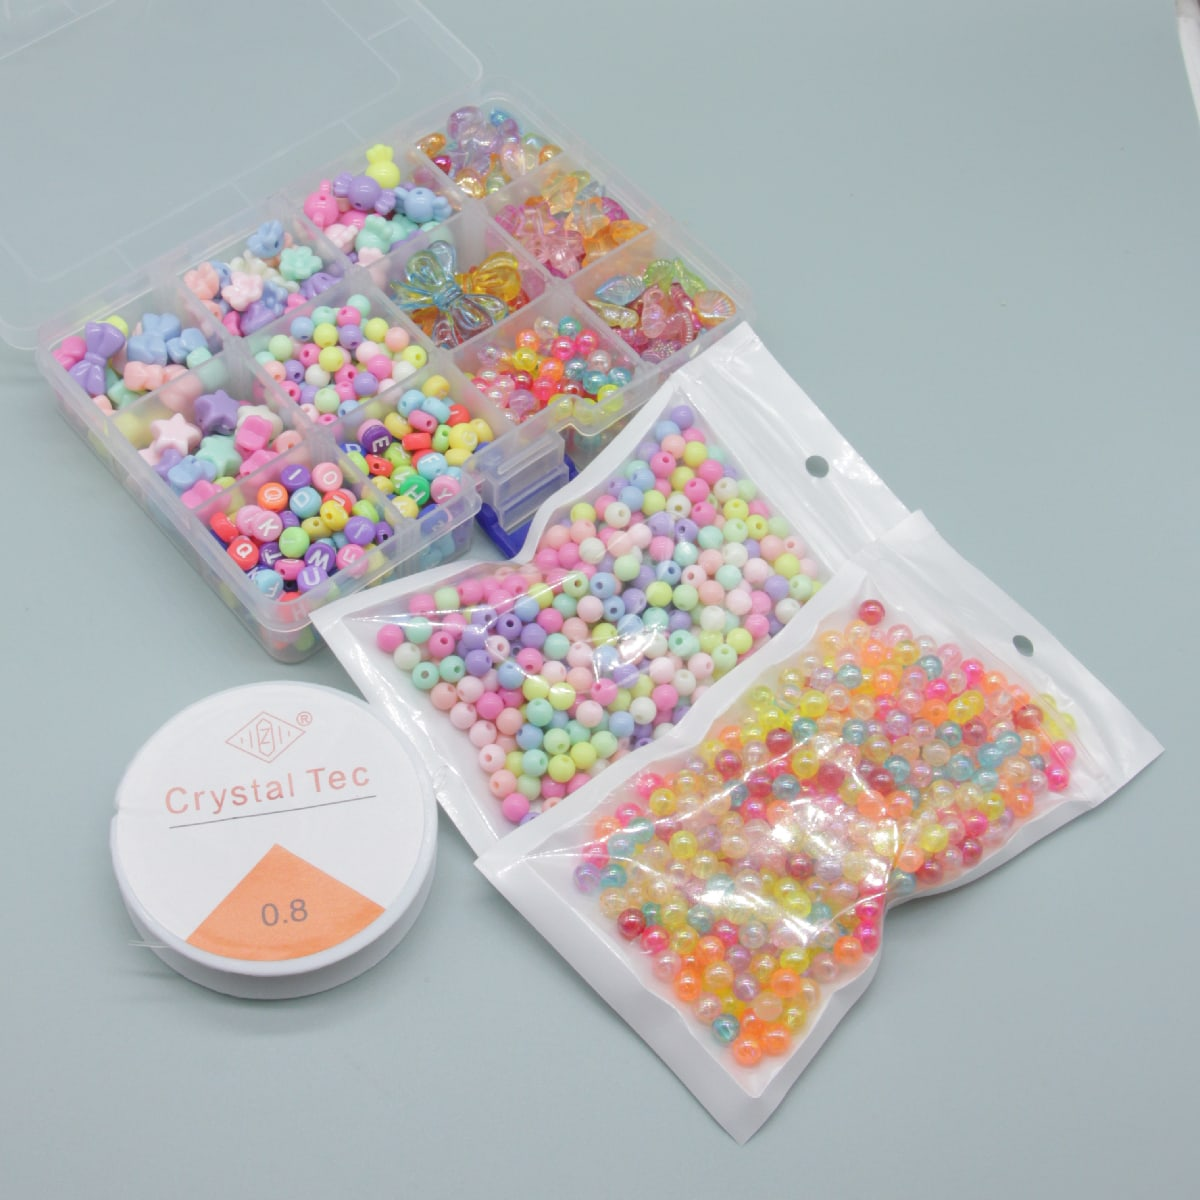 1box Letter Bead & 2packs Bead & 1roll Elastic Thread